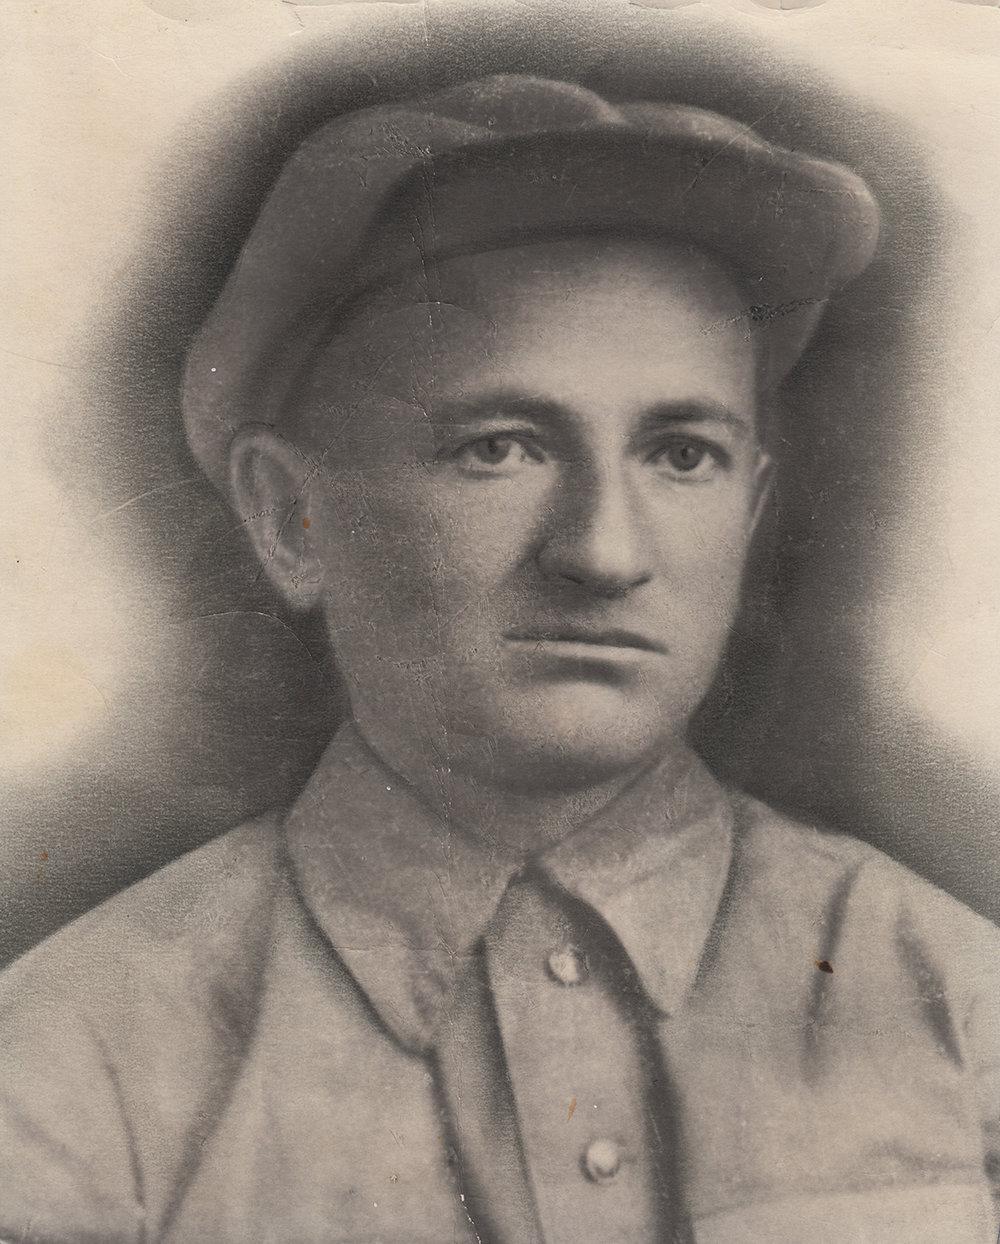 Yakov's father, Moishe Lyubarsky, 1940